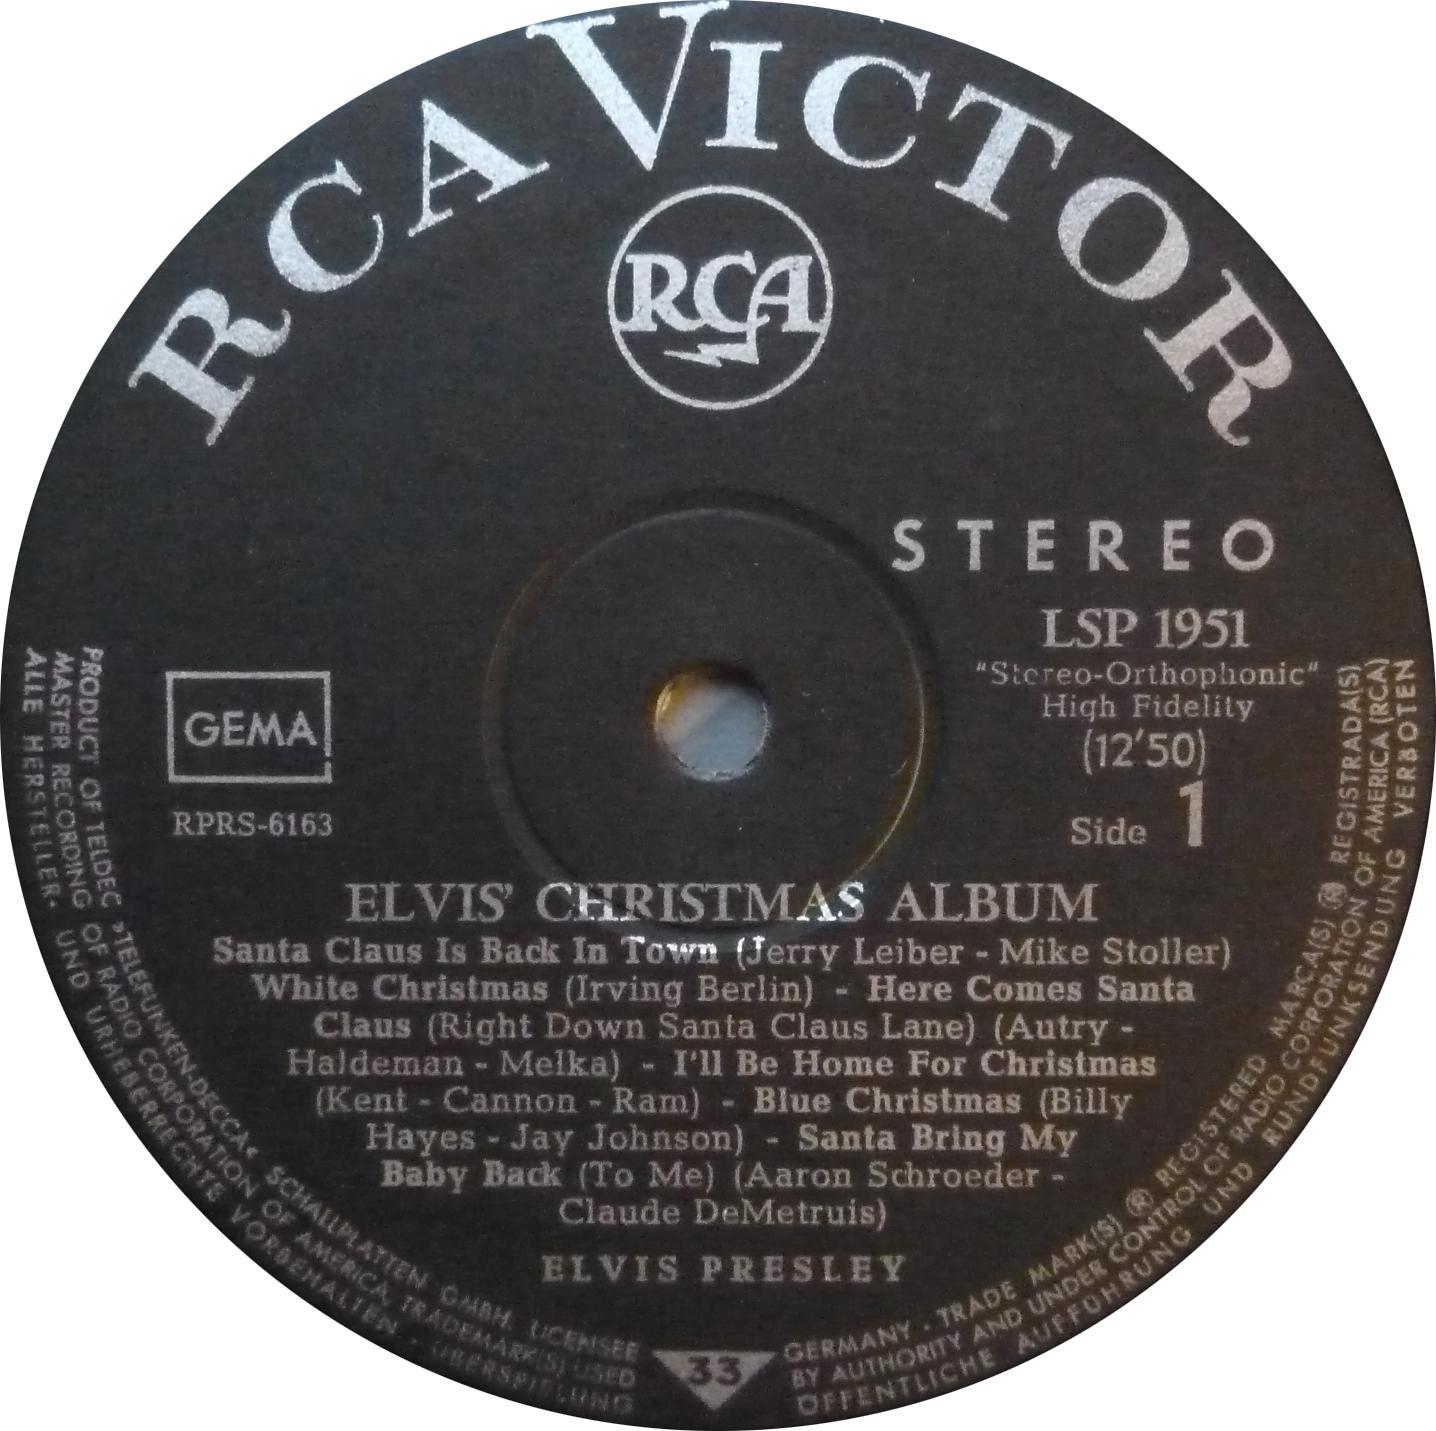 ELVIS' CHRISTMAS ALBUM (1964) Christmasalbum1965v3sytj1u